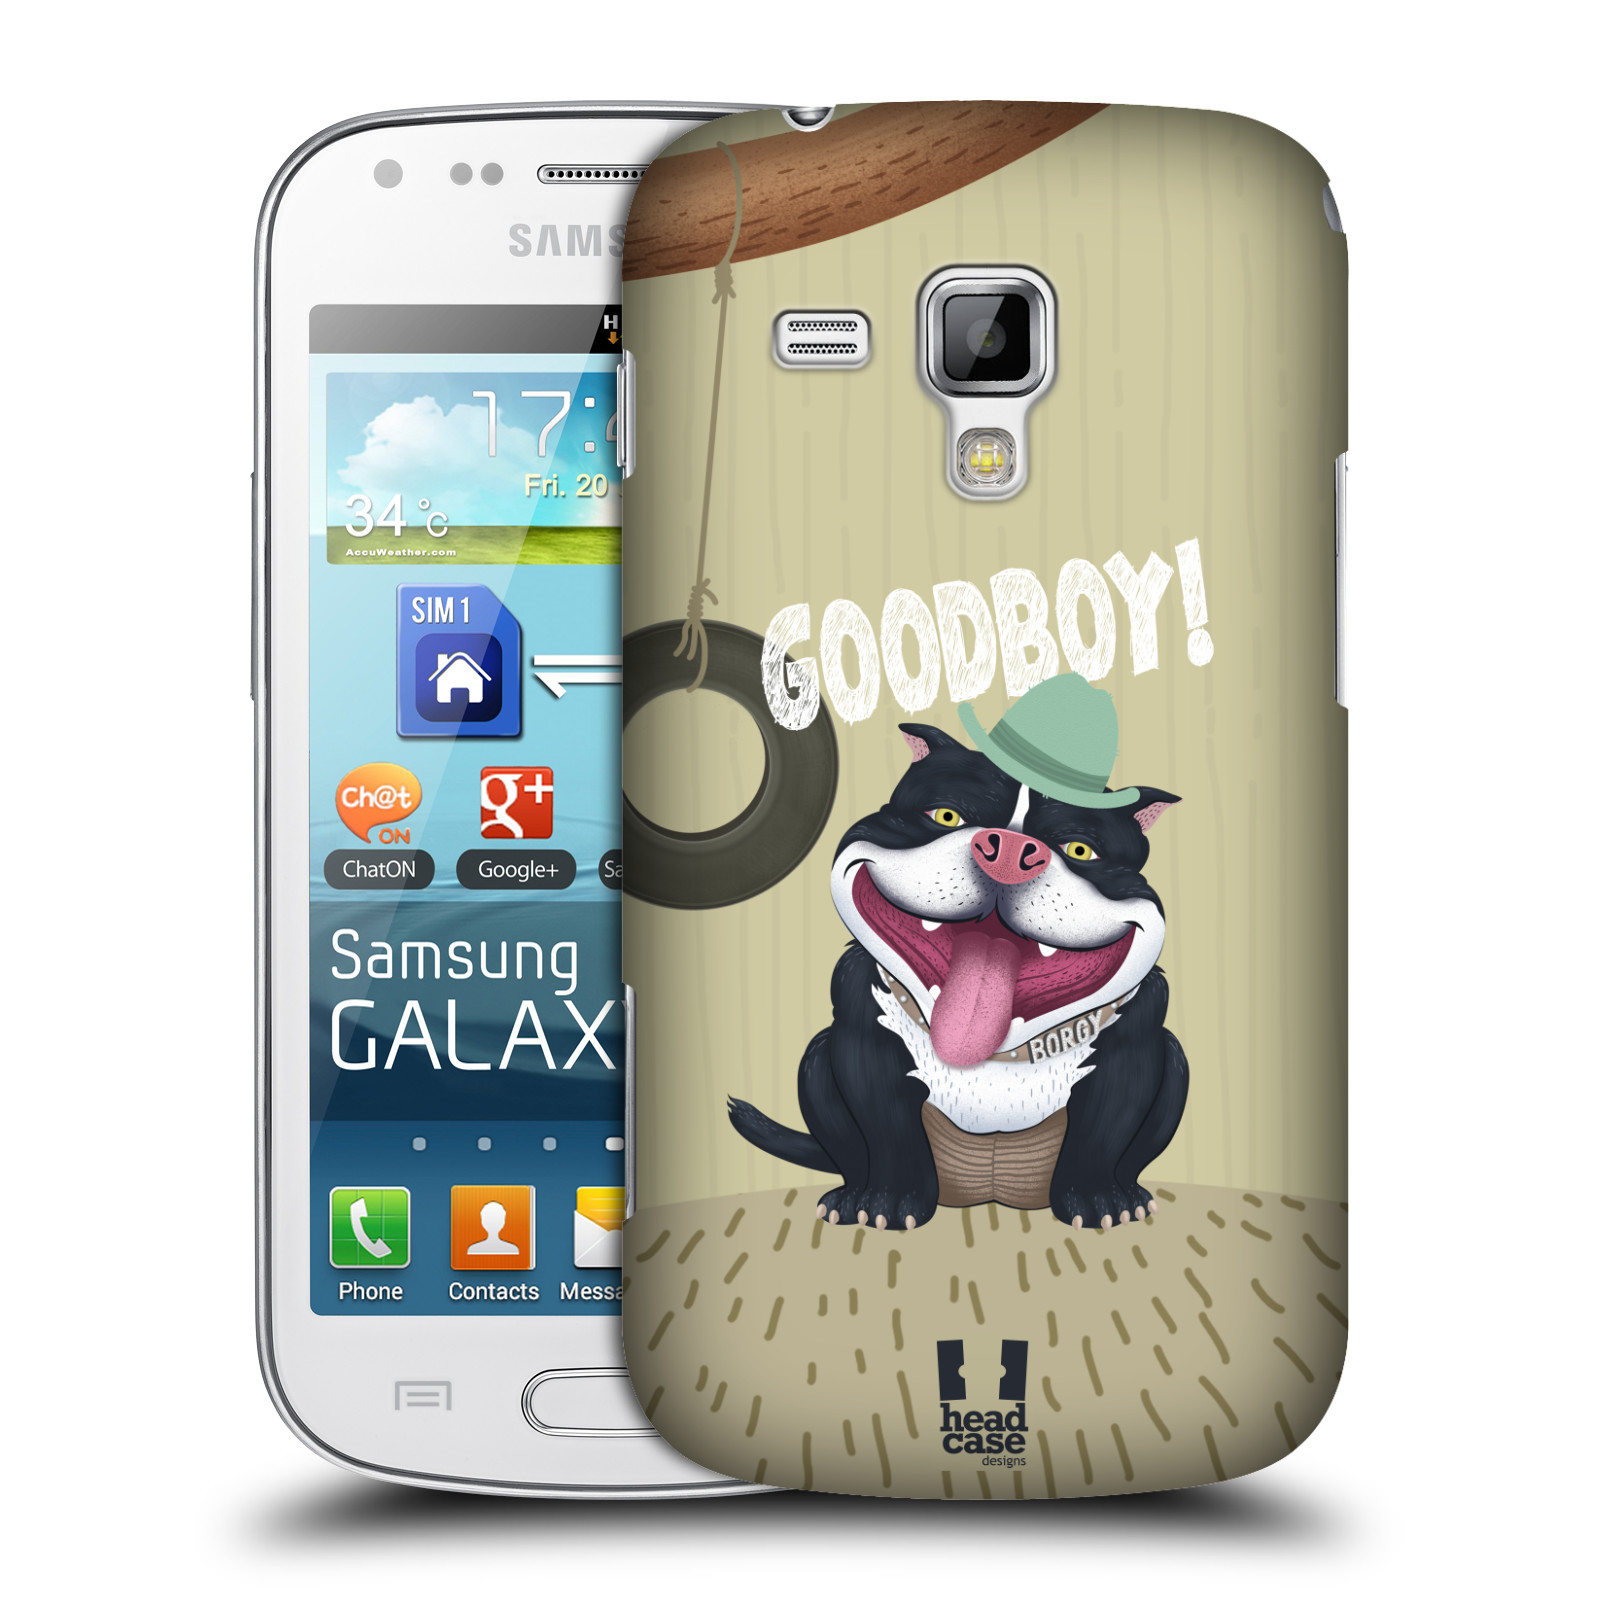 Plastové pouzdro na mobil Samsung Galaxy S Duos HEAD CASE Goodboy! Pejsek (Kryt či obal na mobilní telefon Samsung Galaxy S Duos GT-S7562)